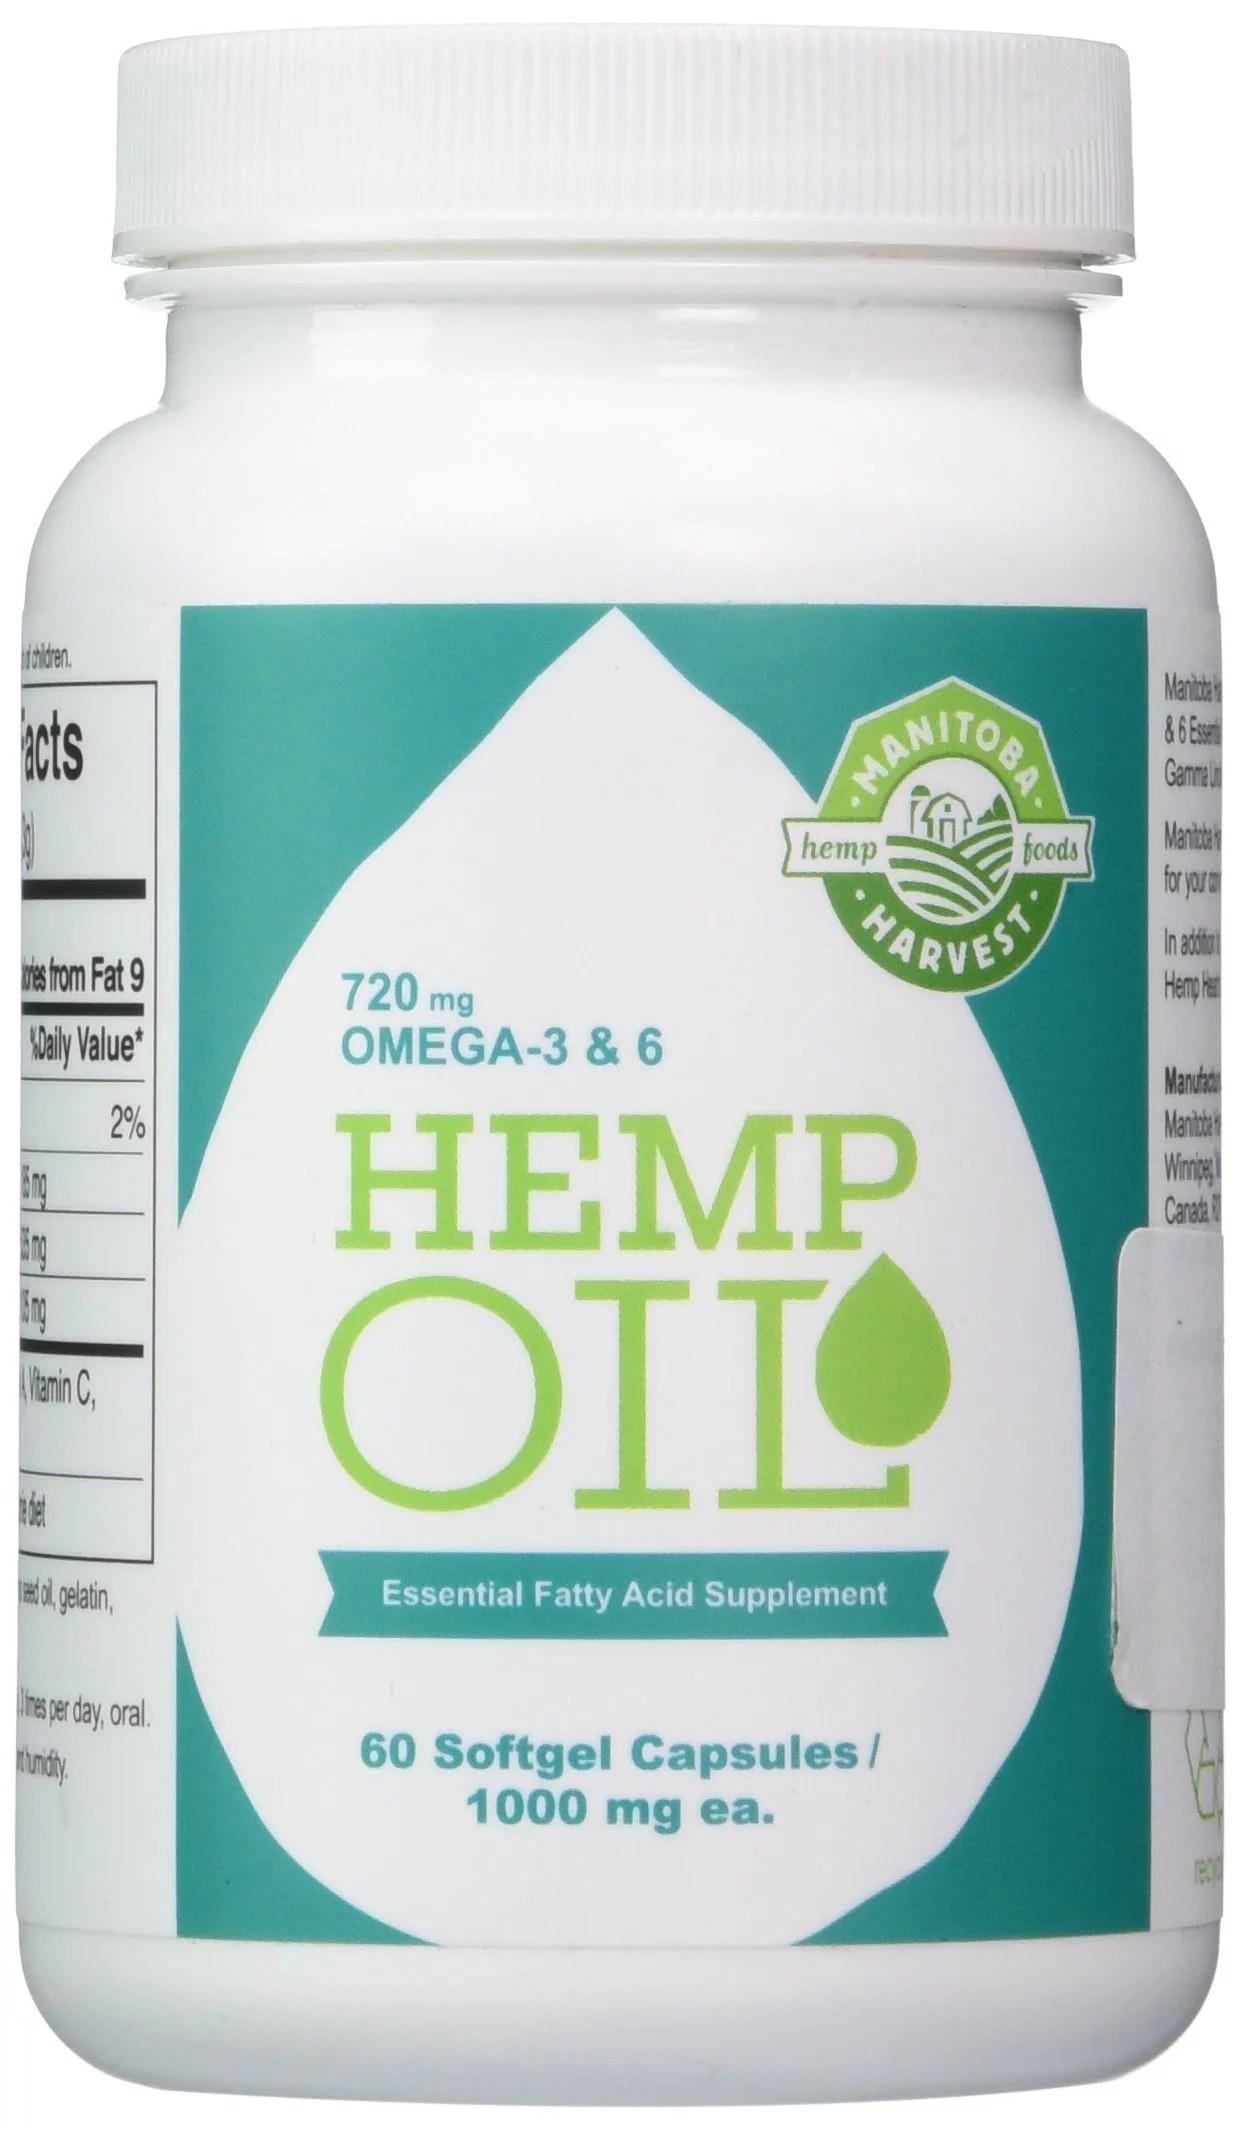 Manitoba Harvest Hemp Seed Oil Capsules - 60 Capsules ...